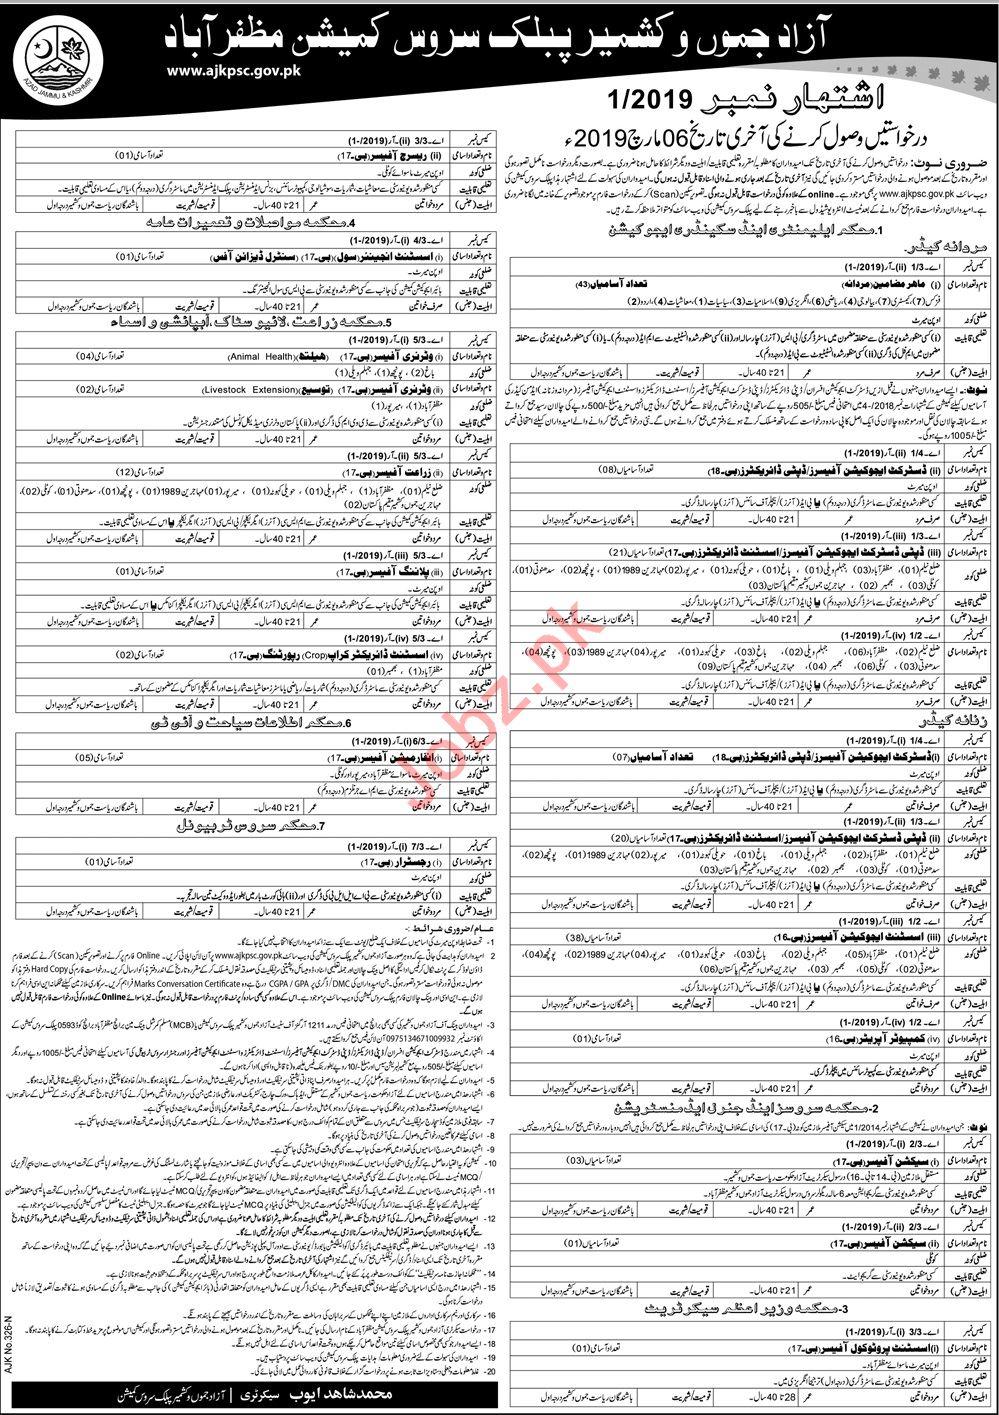 Azad Jammu & Kashmir Public Service Commission Jobs